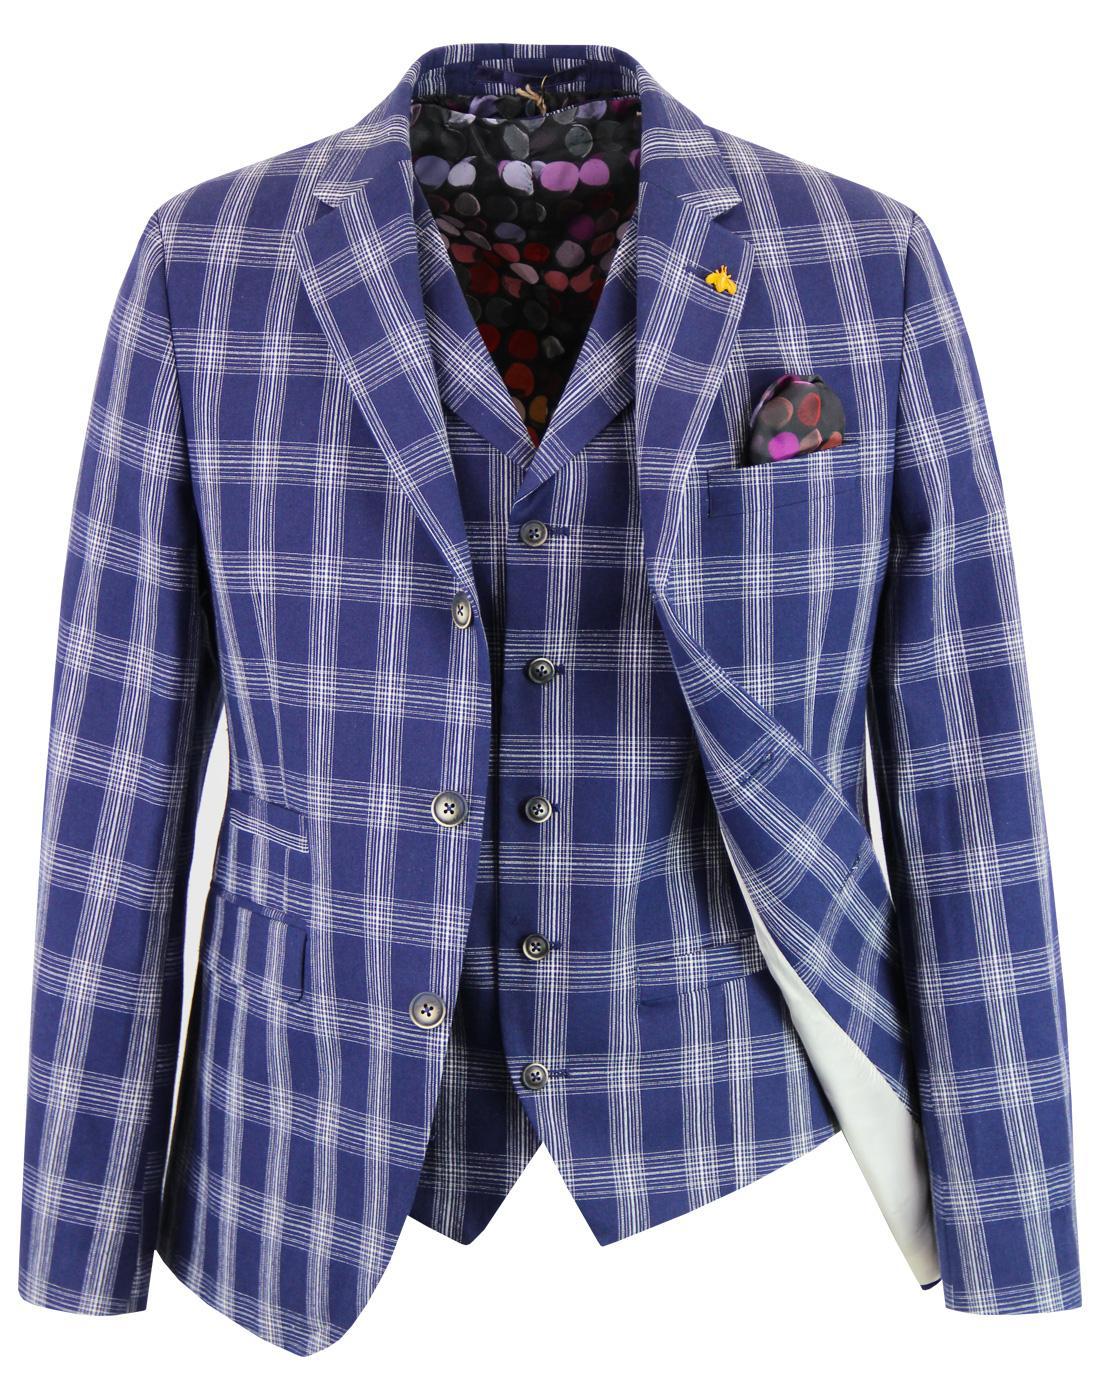 Moorgate GIBSON LONDON Matching Blazer & Waistcoat